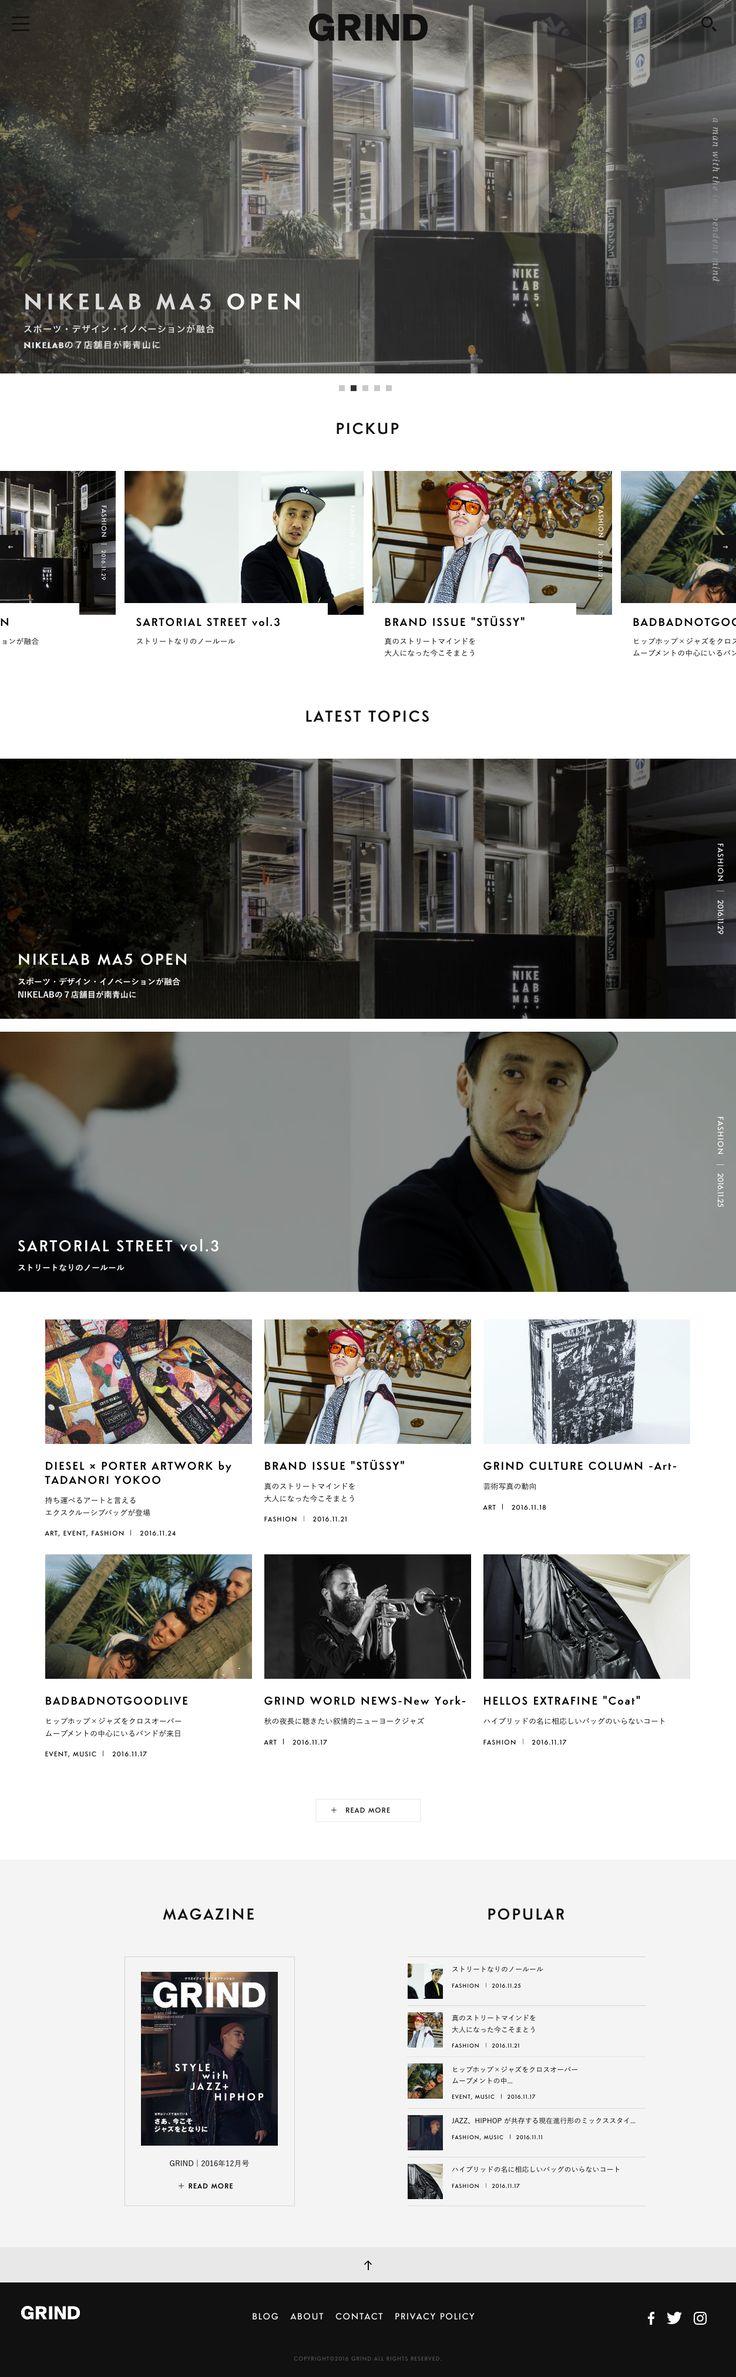 GRIND – 雑誌「GRIND (グラインド)」のオフィシャルサイト。 : 81-web.com【Webデザイン リンク集】